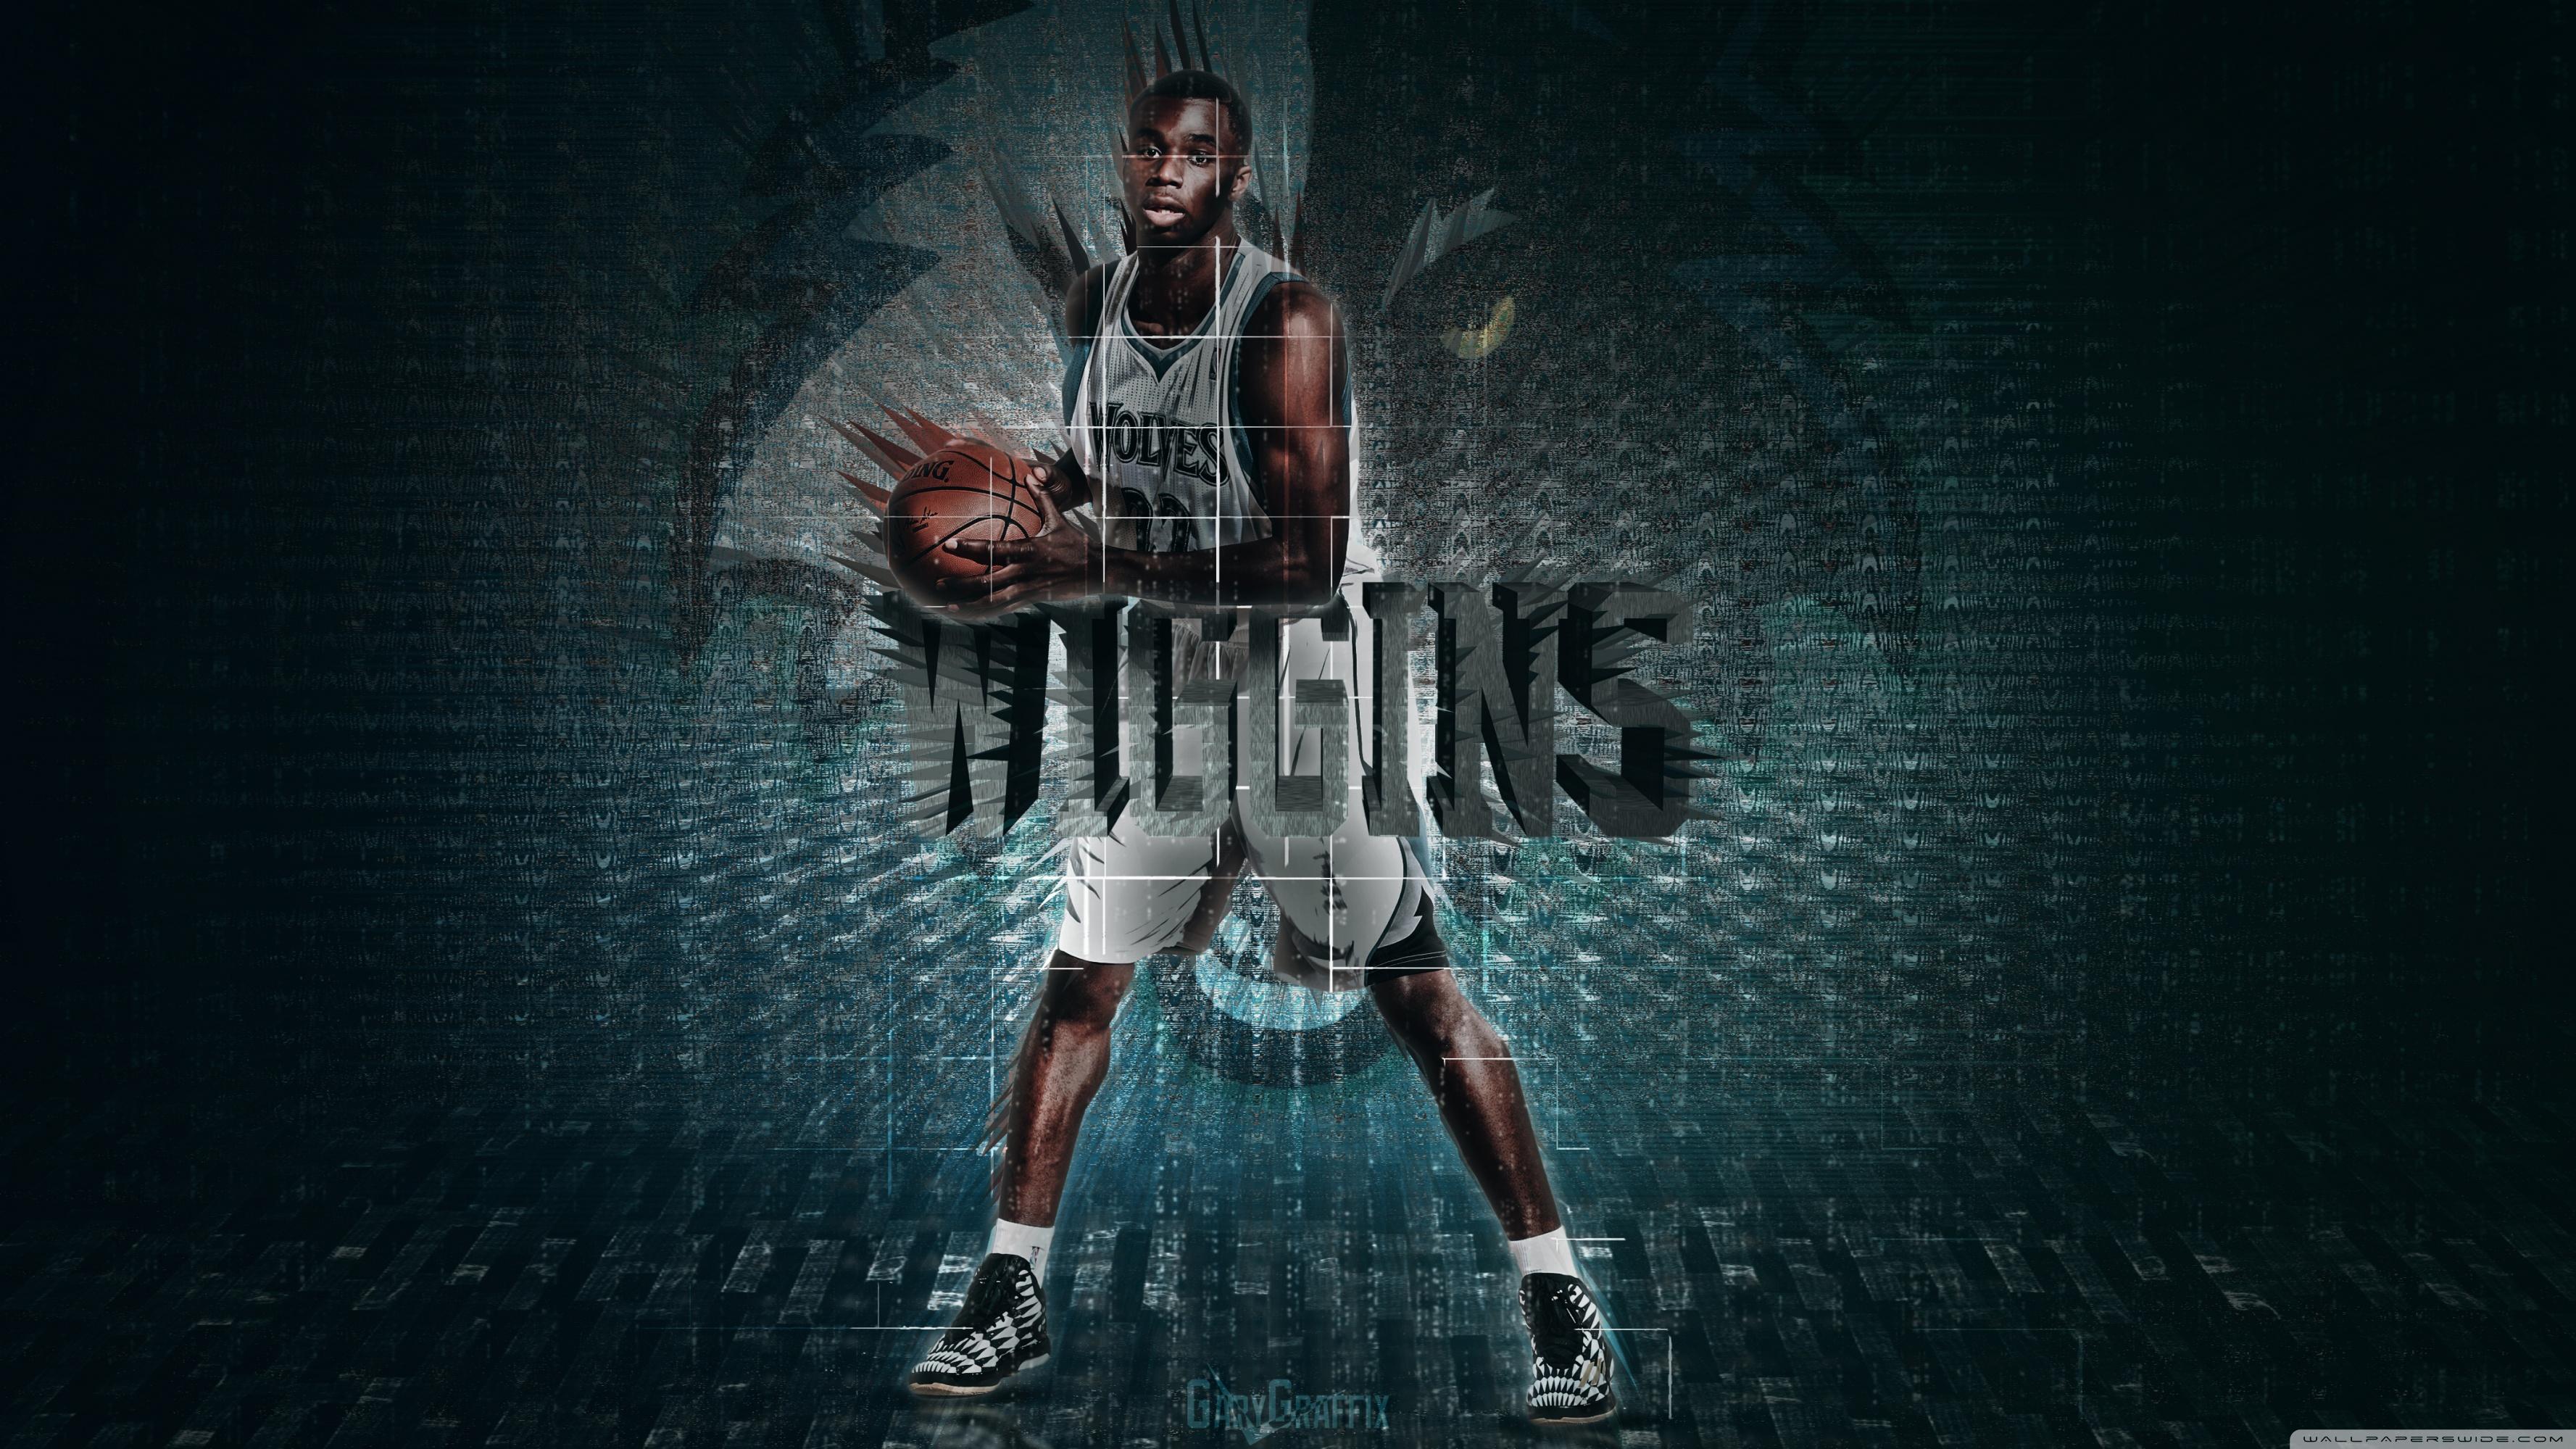 download Andrew Wiggins Timberwolves 4K HD Desktop Wallpaper 3554x1999